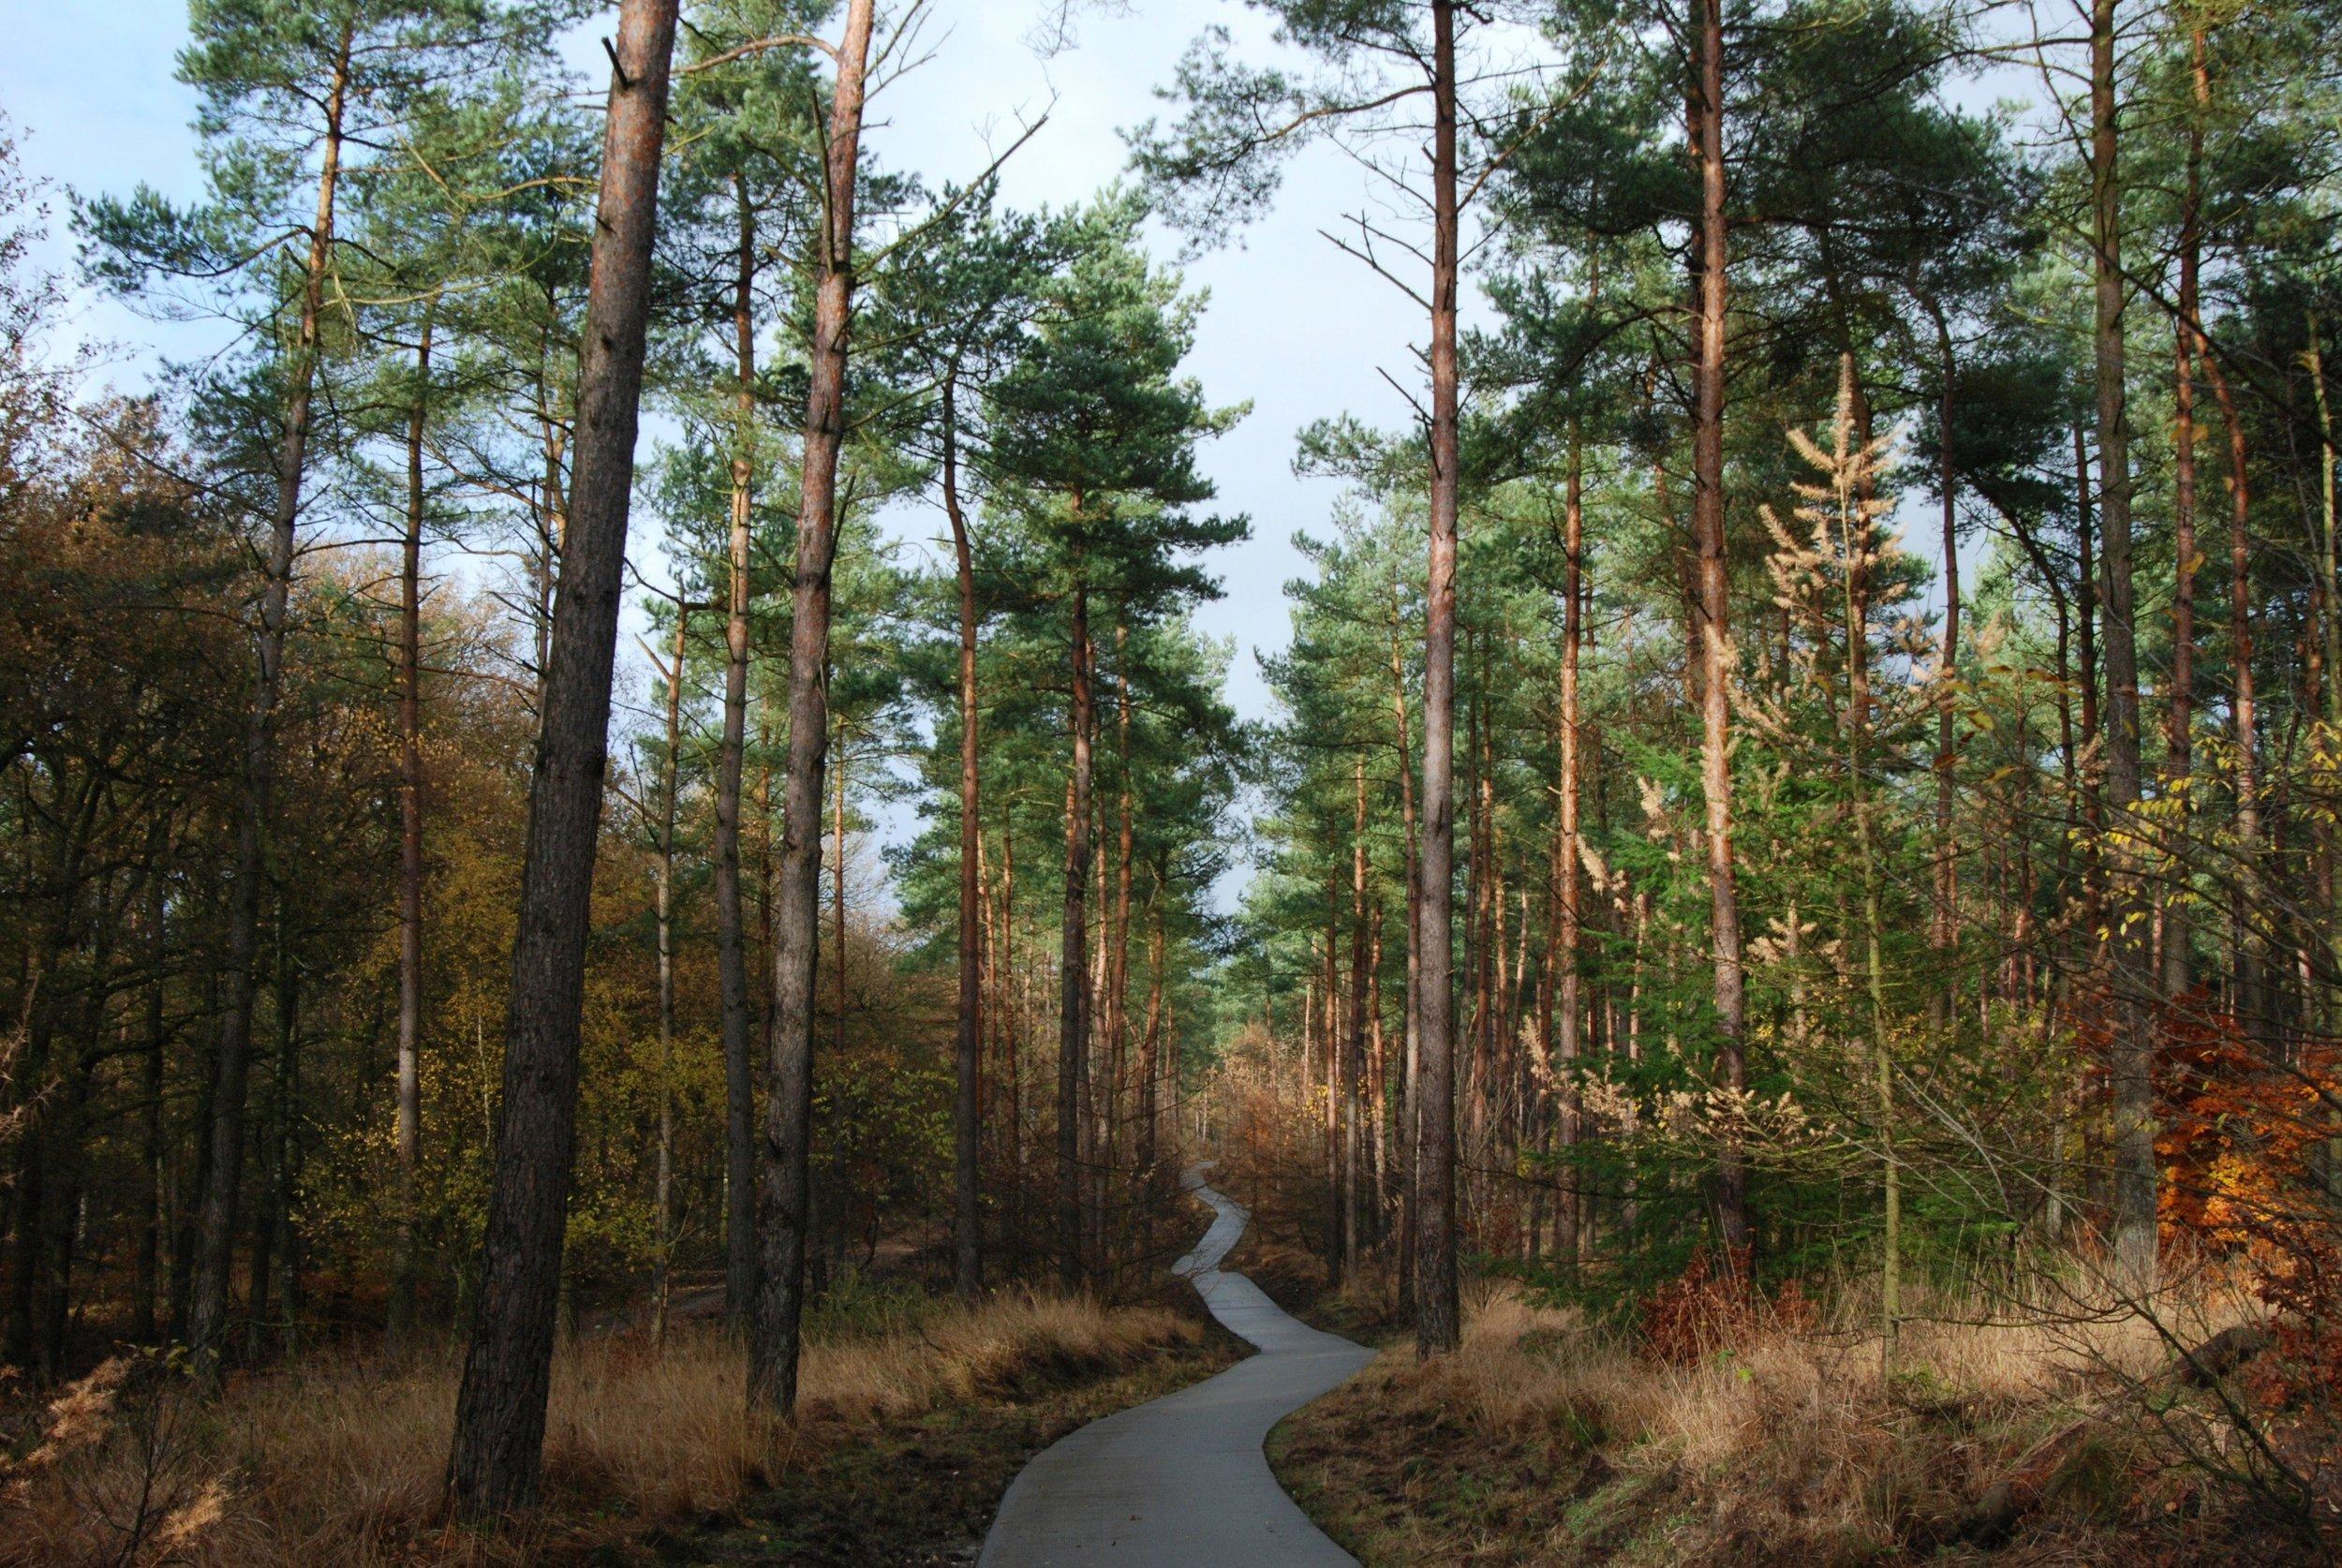 forestpath2.jpg